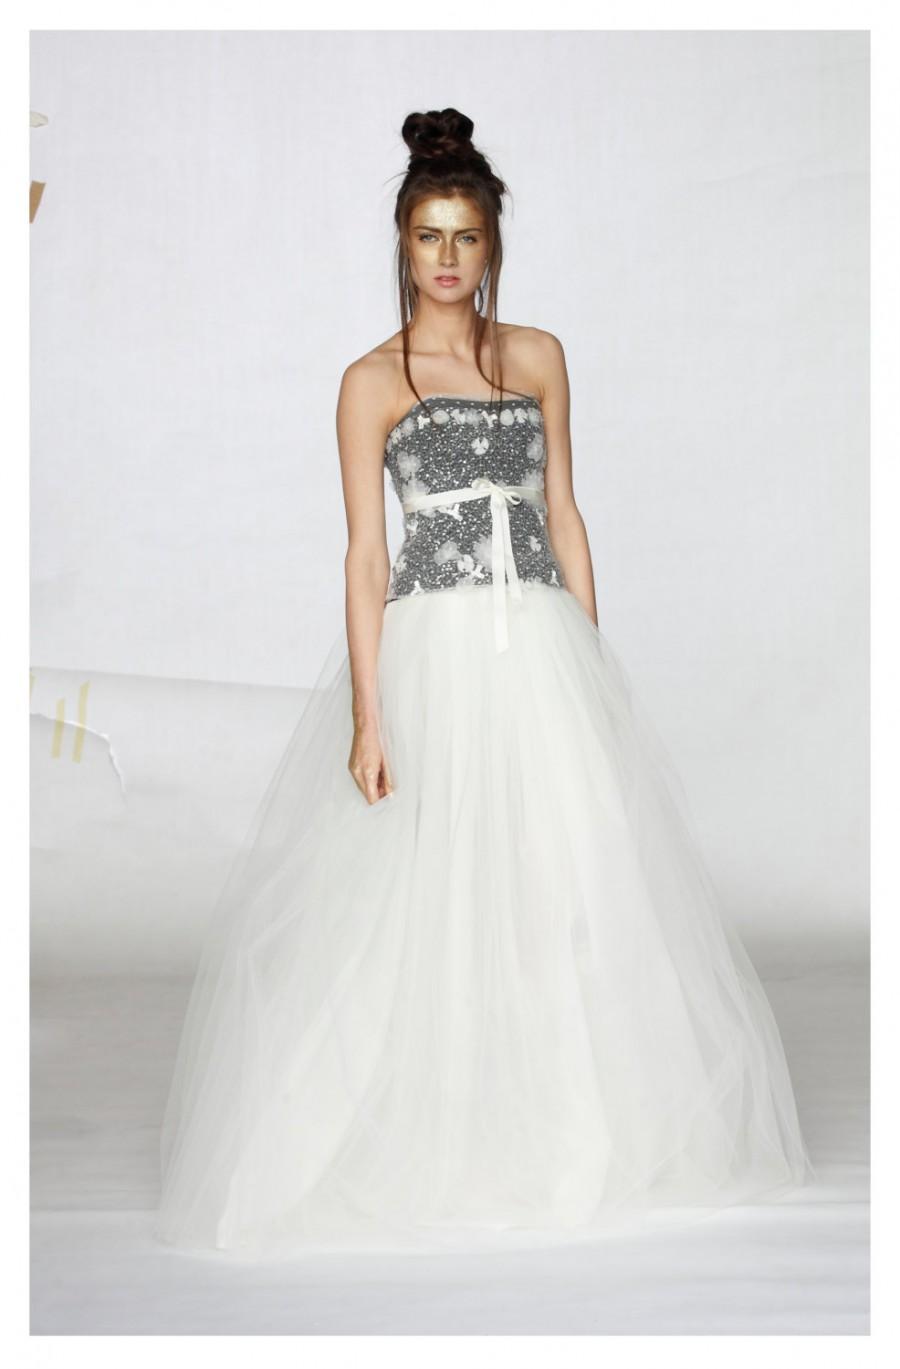 Wedding - Wedding Skirt, Bridal Separates, Tulle Skirt, Bridal Skirt, Wedding Tulle Skirt, Long Skirt, Womens Wedding Clothing, Wedding Maxi Skirt